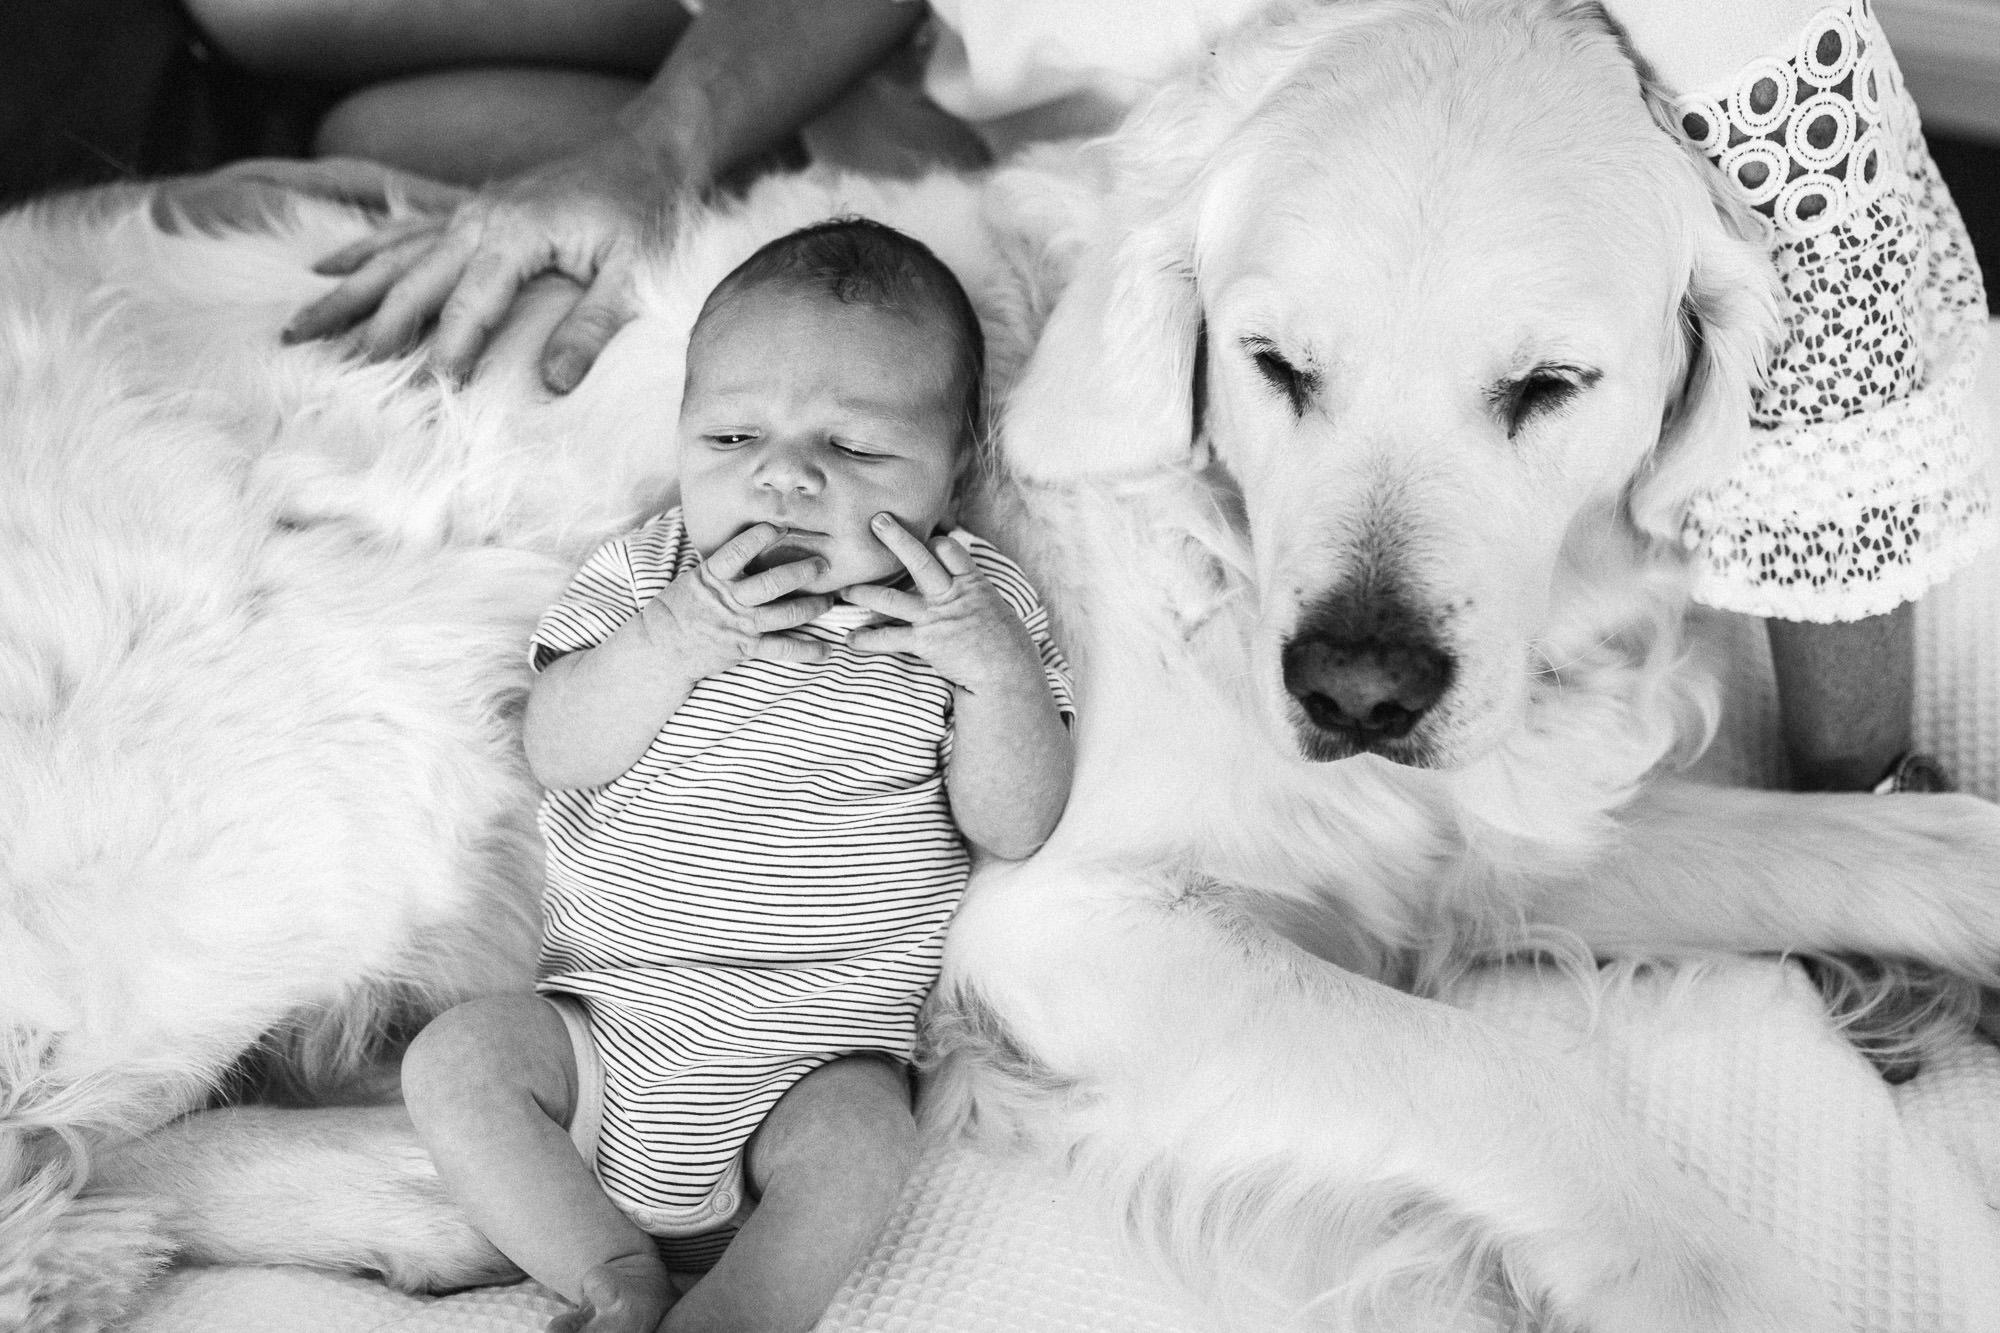 baby & d0g.jpg